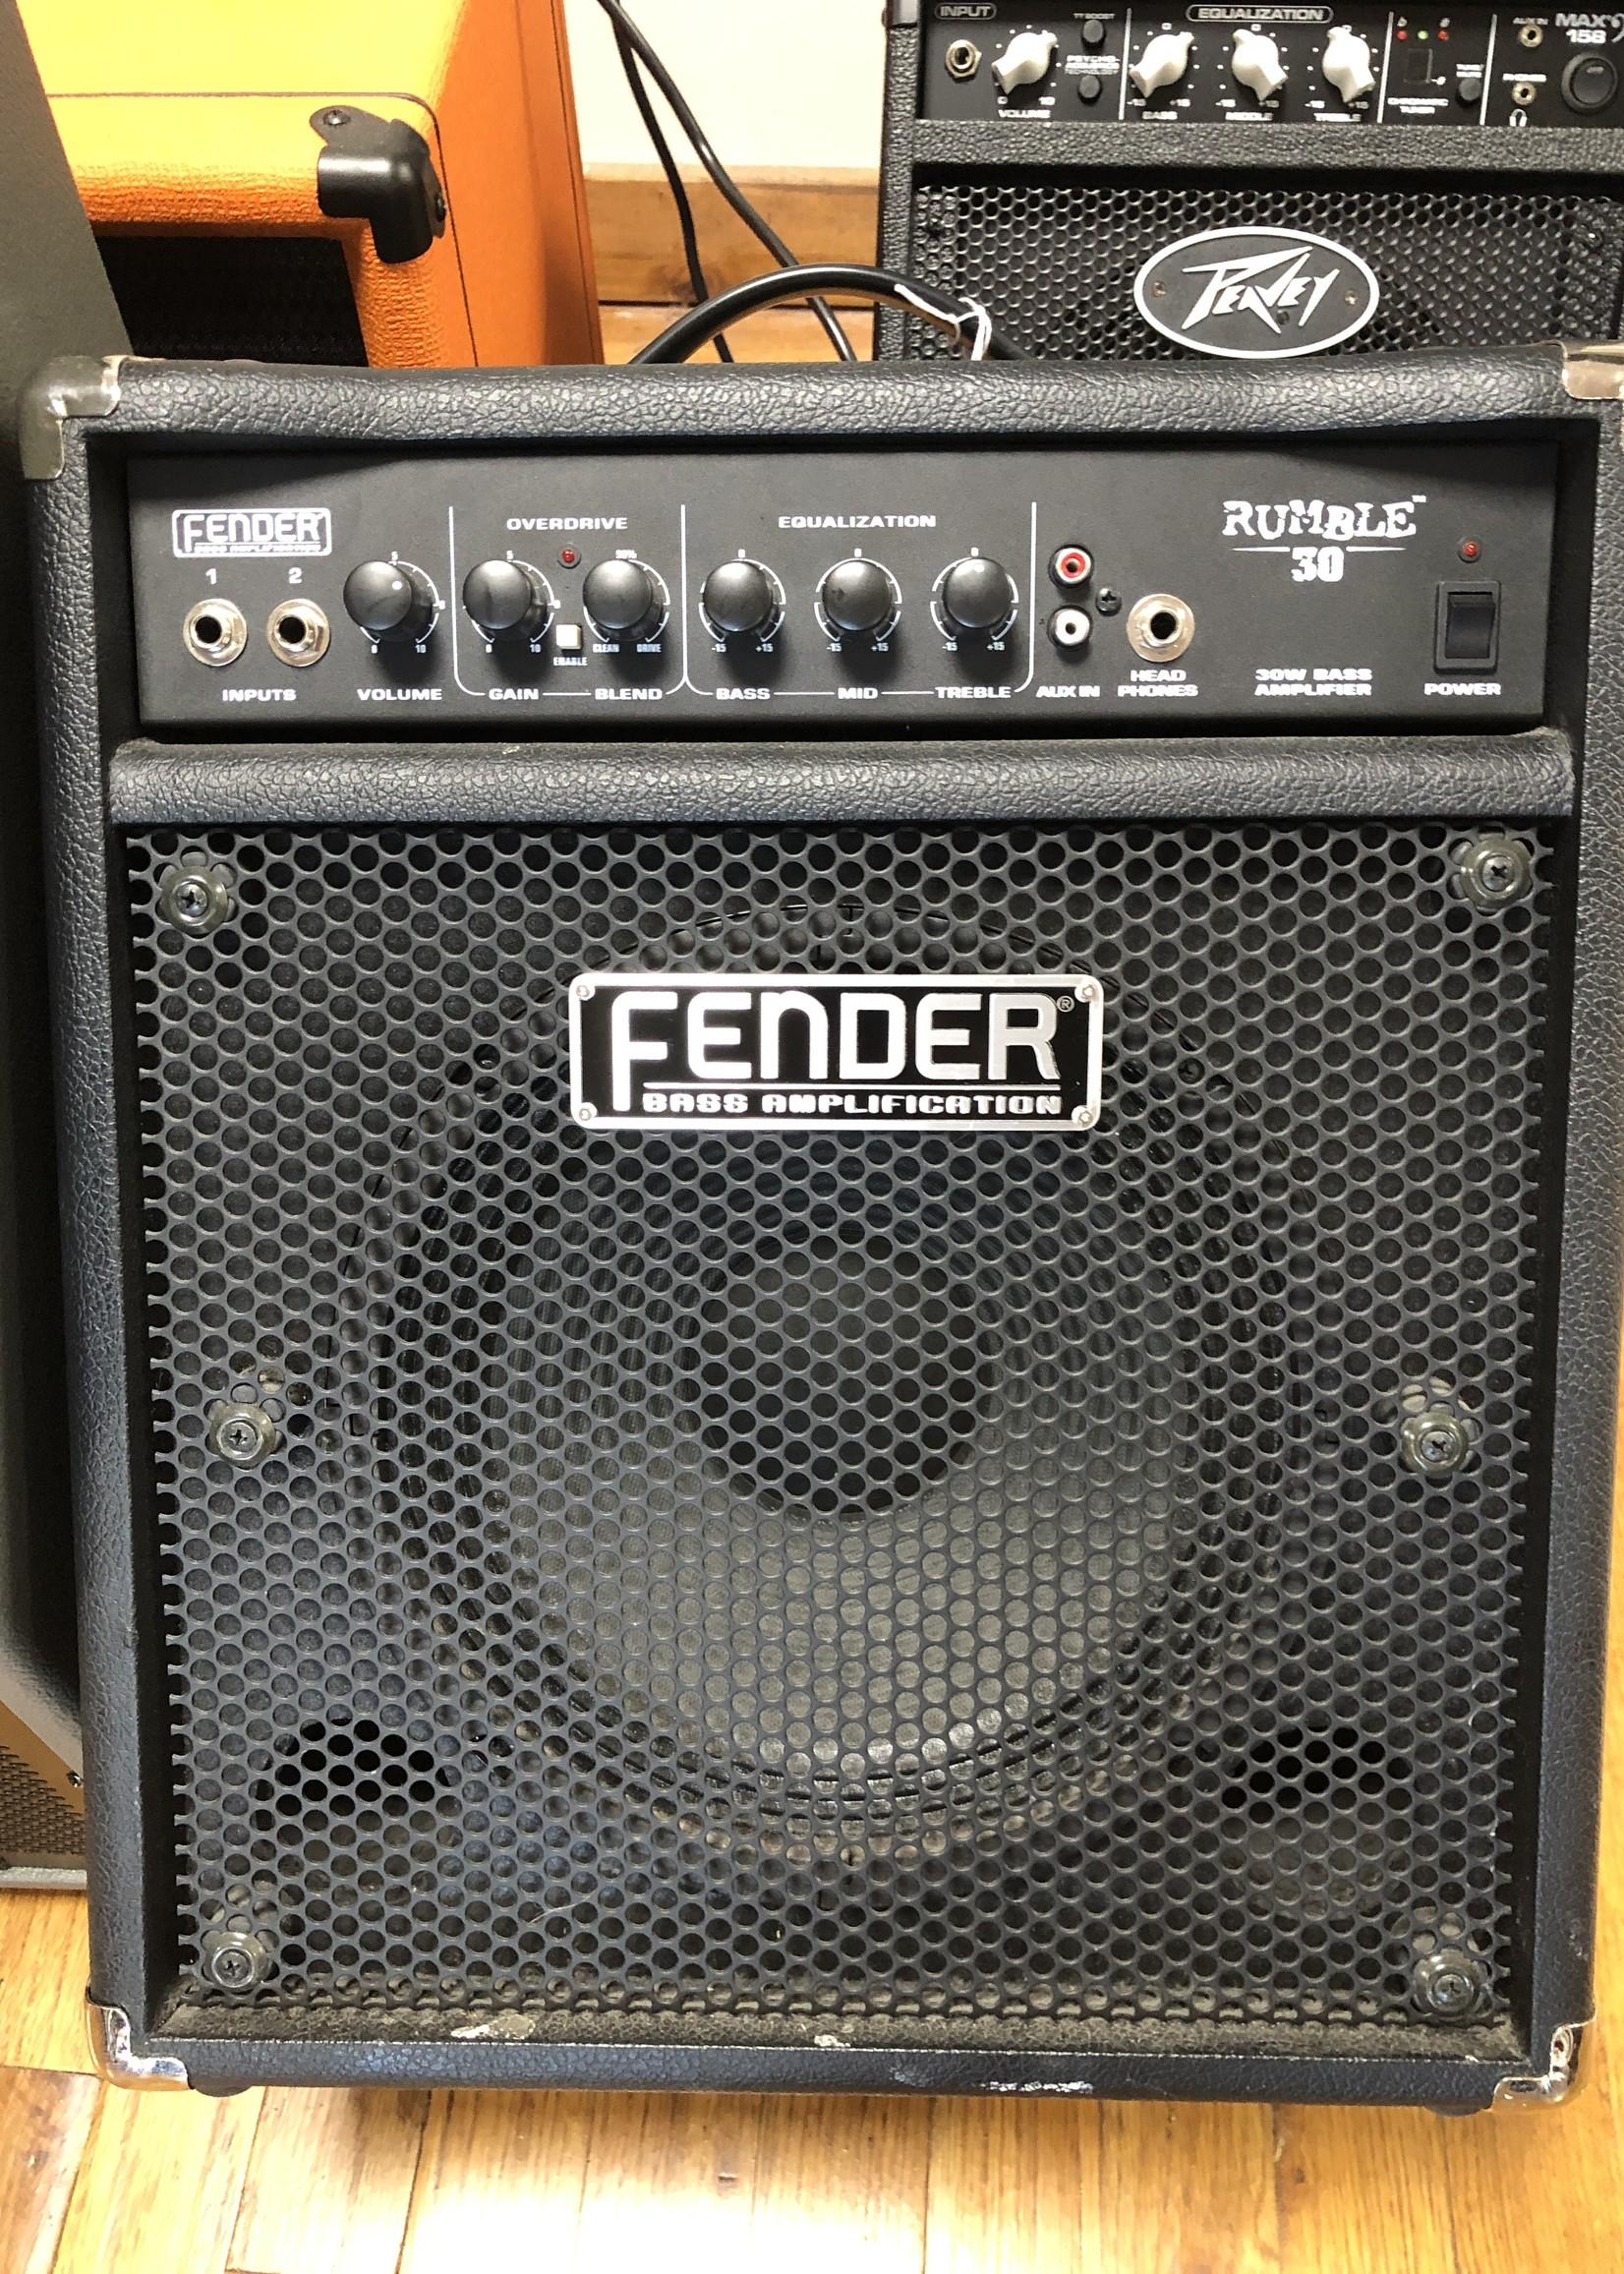 Fender Rumble 30 (con) JW